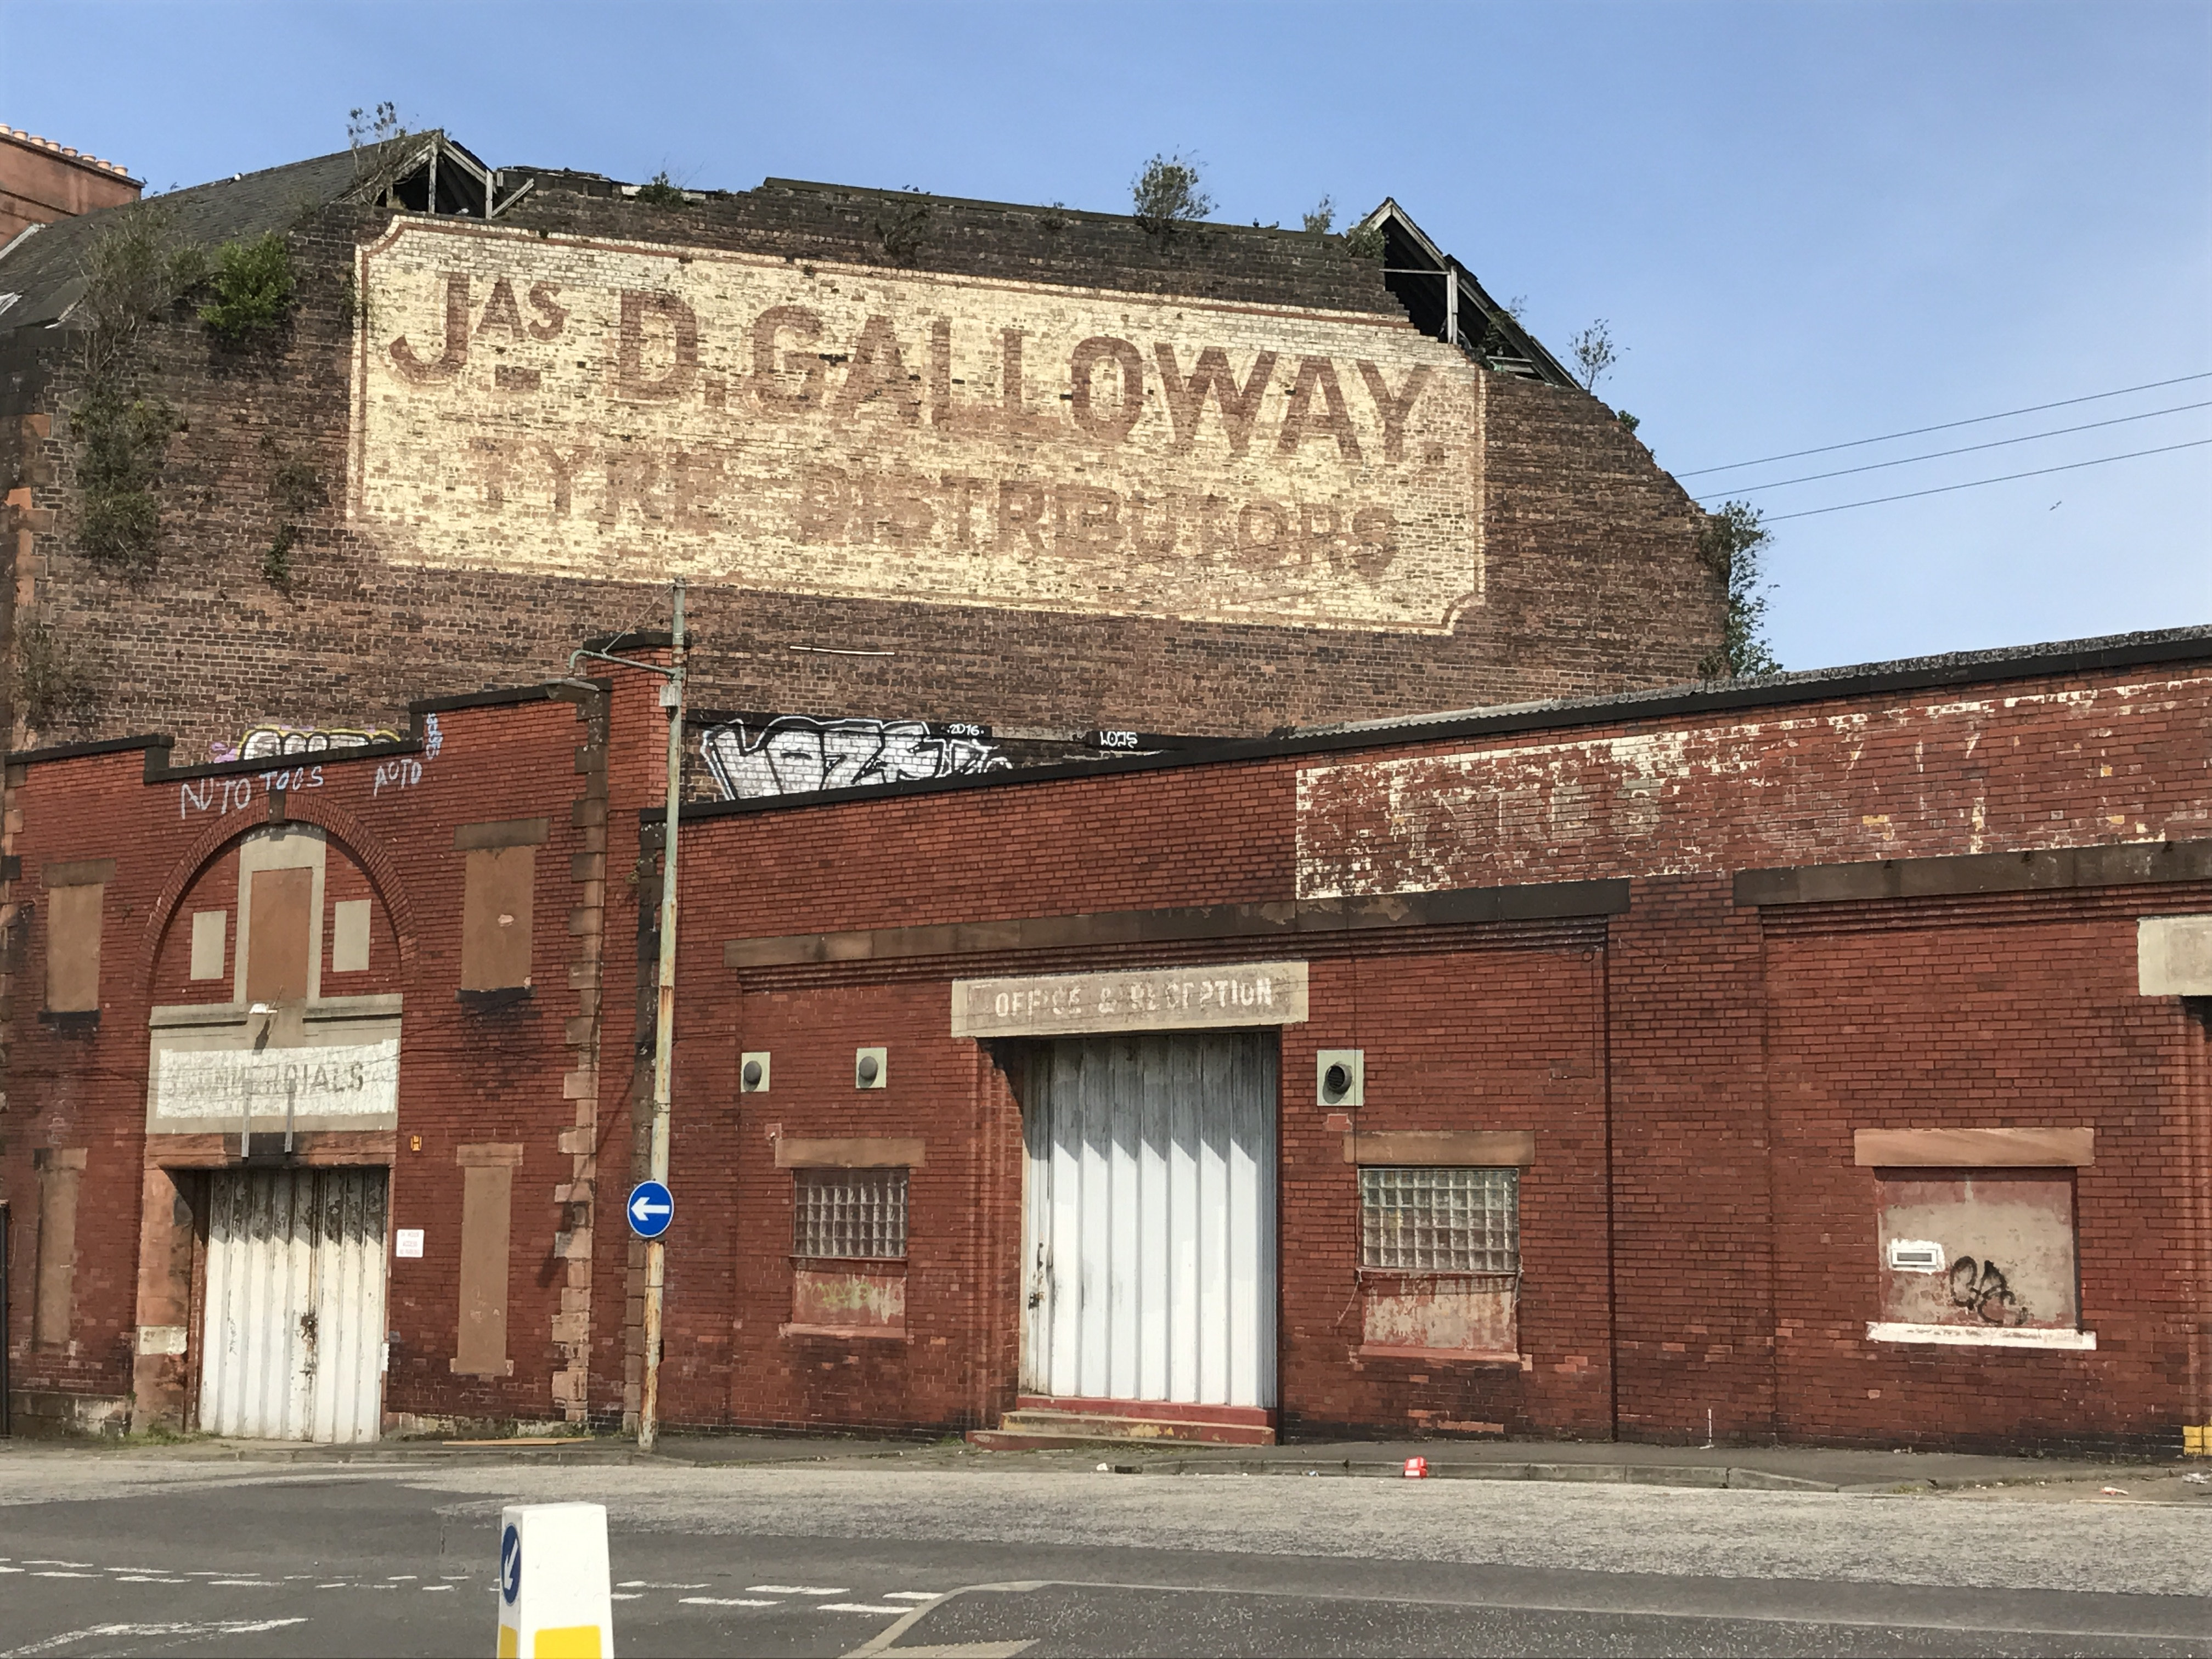 Jas D. GALLOWAY Tyre Distributors